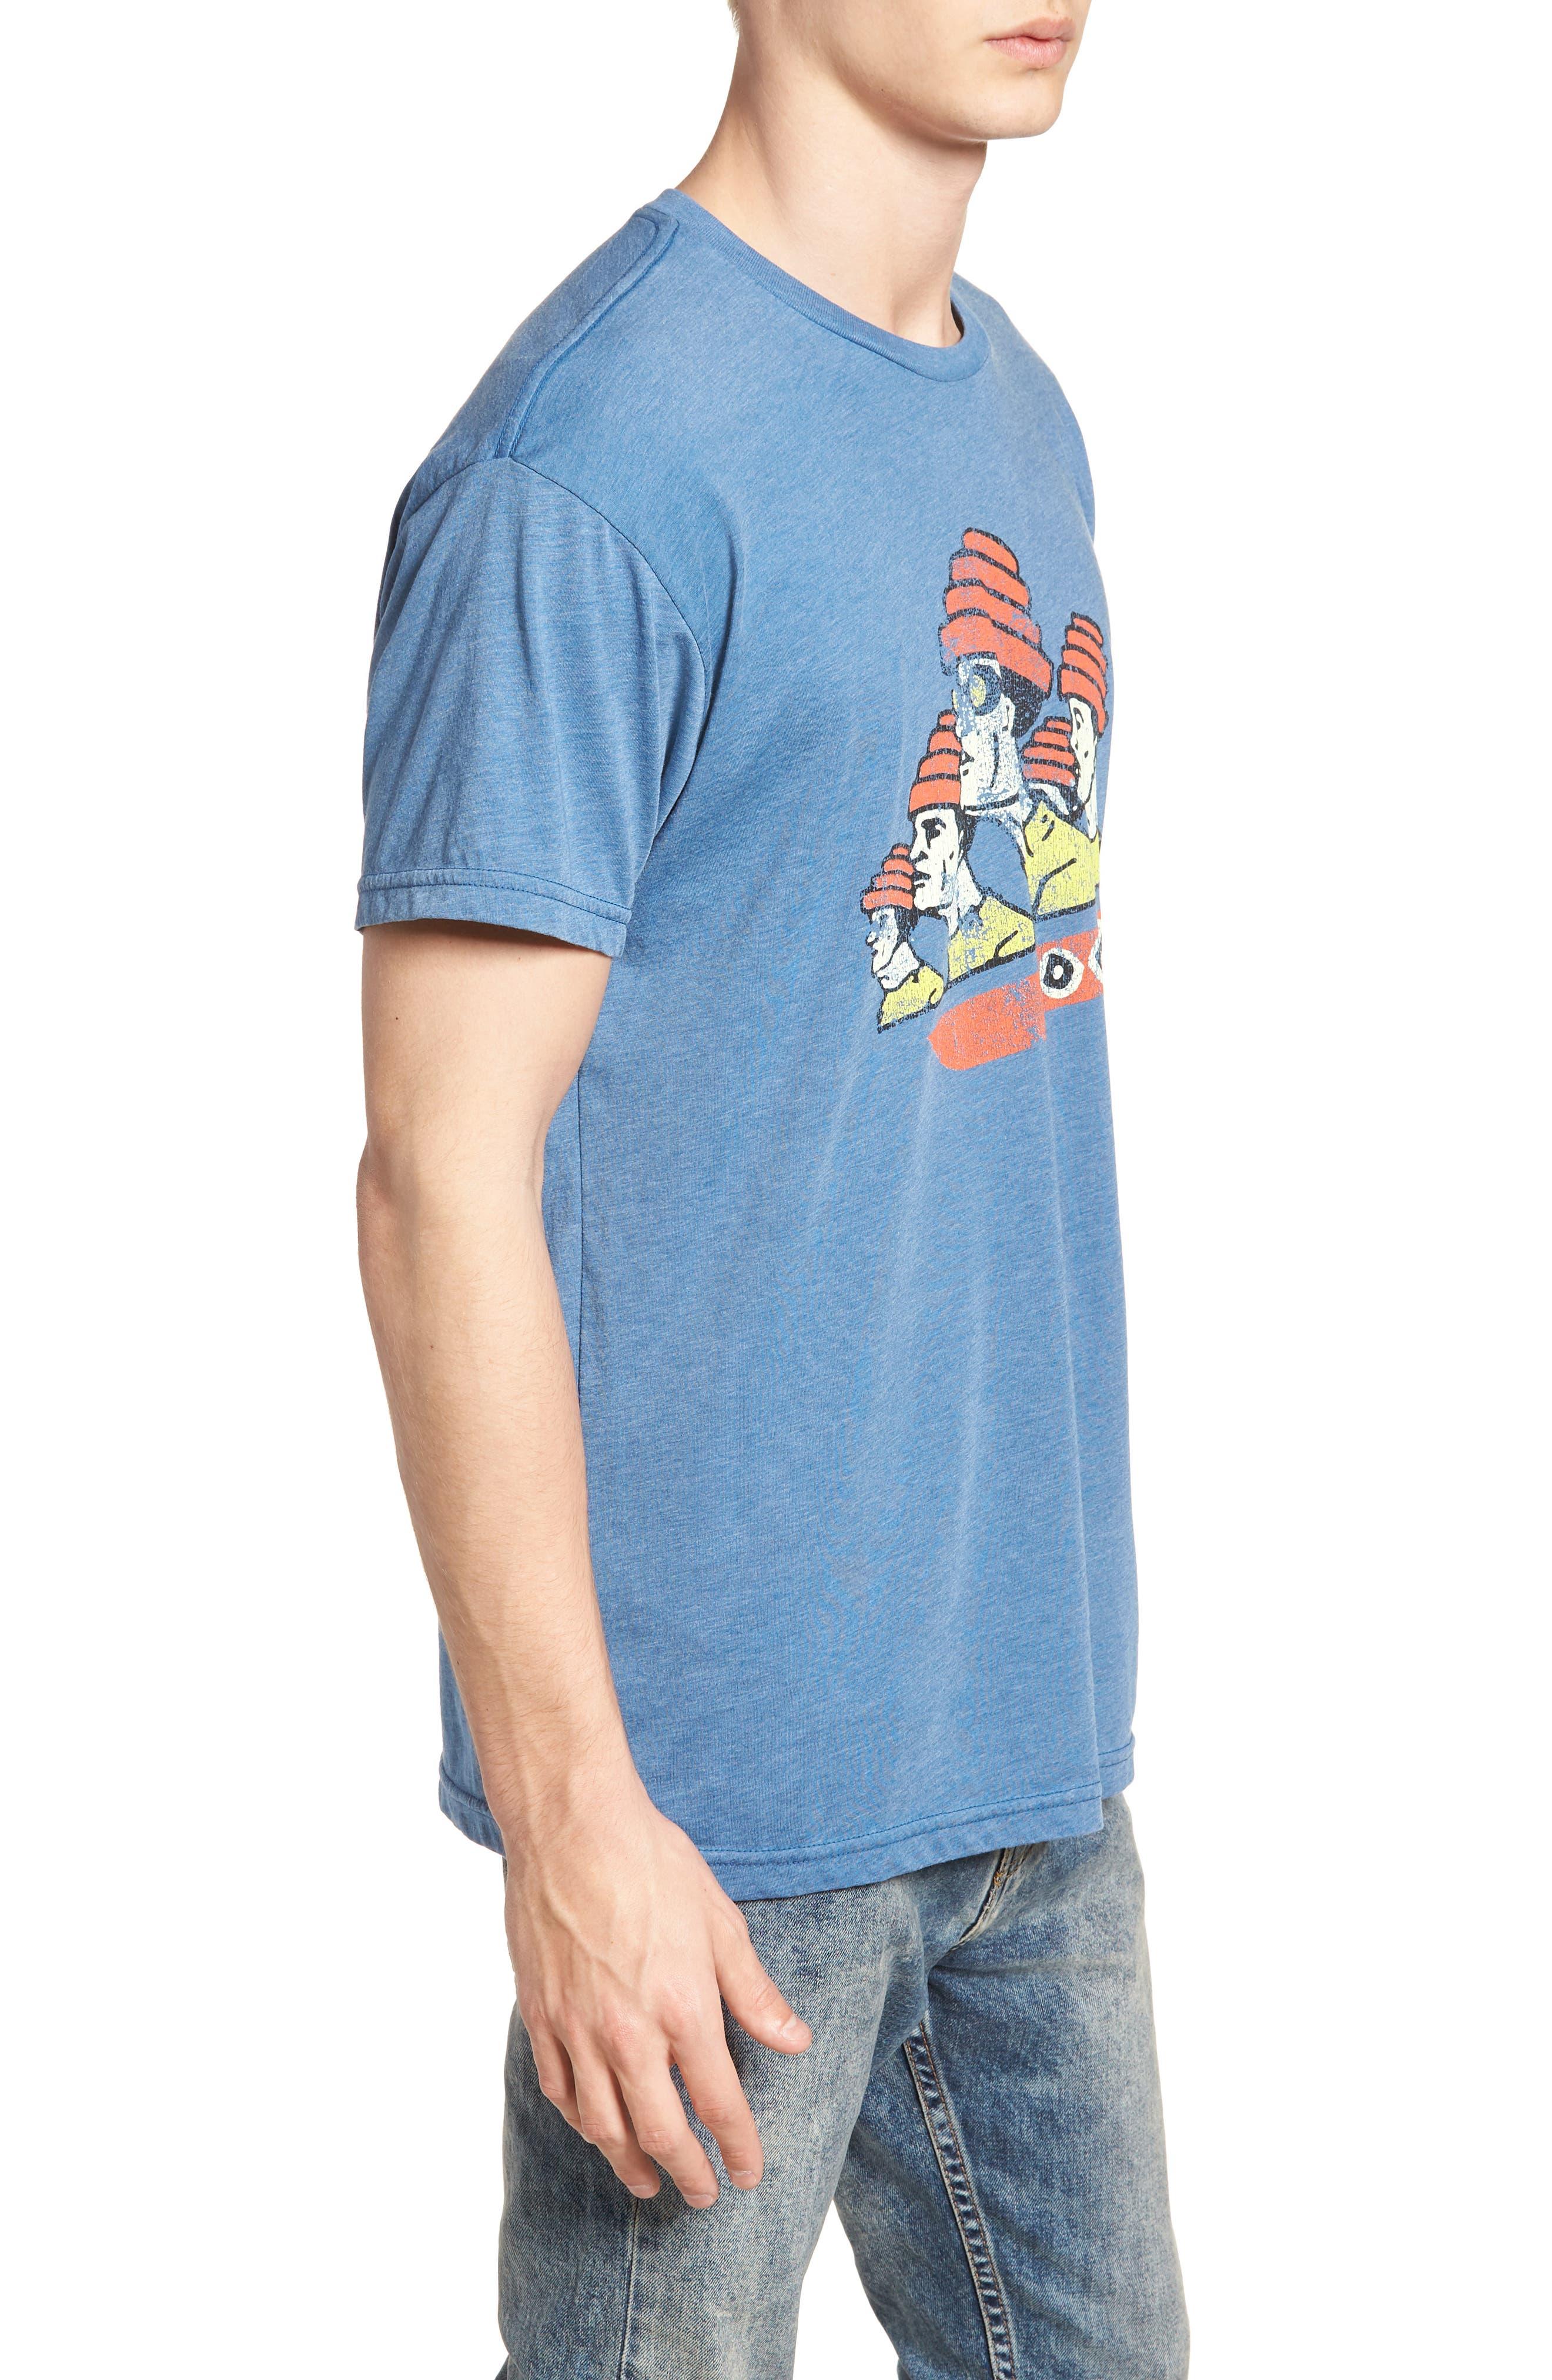 Devo Graphic T-Shirt,                             Alternate thumbnail 3, color,                             400